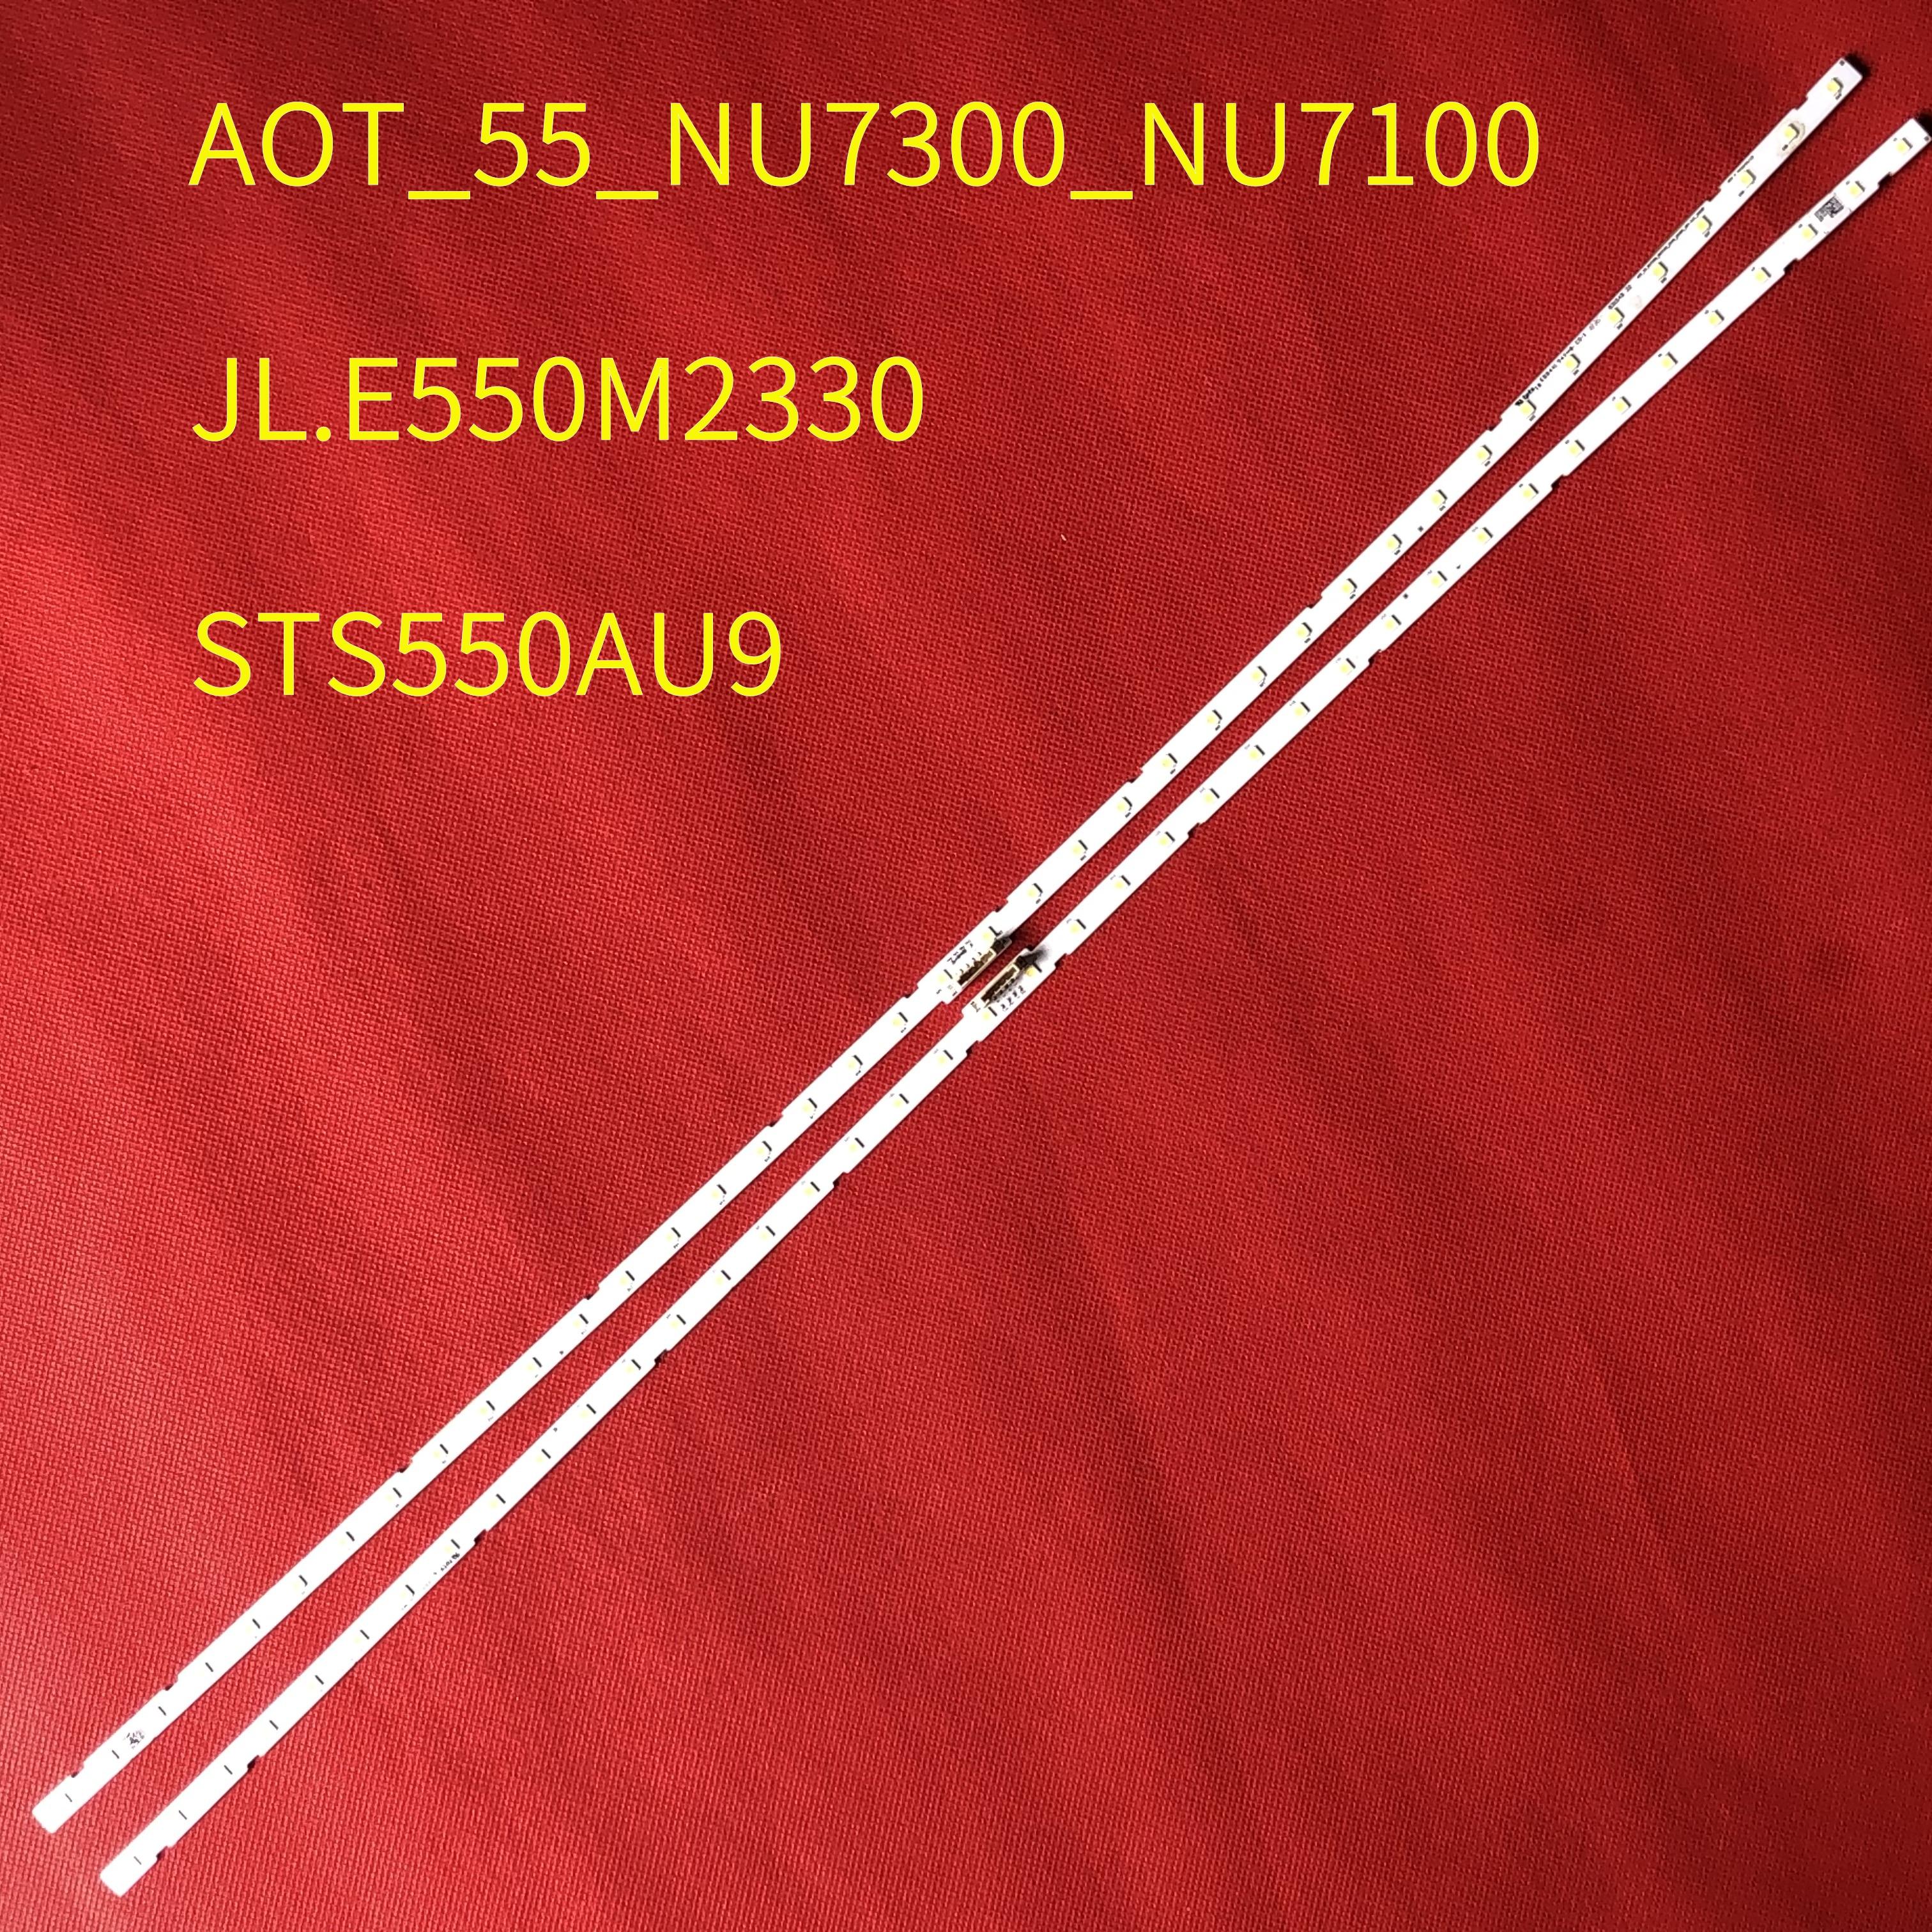 Tira conduzida Luz de Fundo para Samusng 55NU7100 UE55NU7300 UE55NU7100 UE55NU7105 AOT_55_NU7300_NU7100 BN96-45913A BN61-15485A